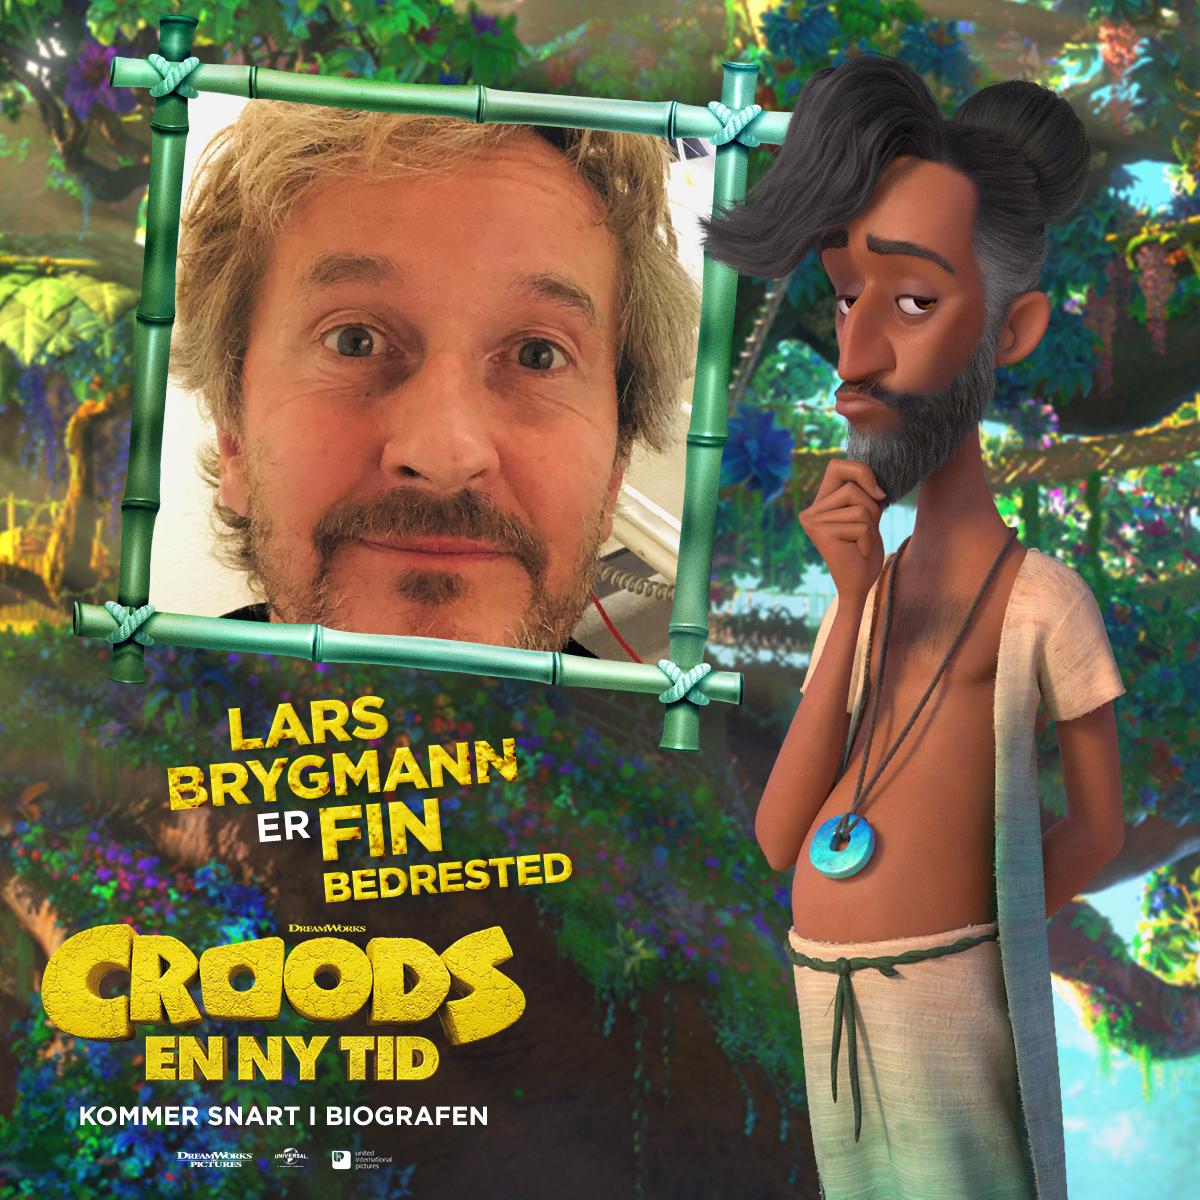 Croods - Karakterkort - Fin (Lars Brygmann)